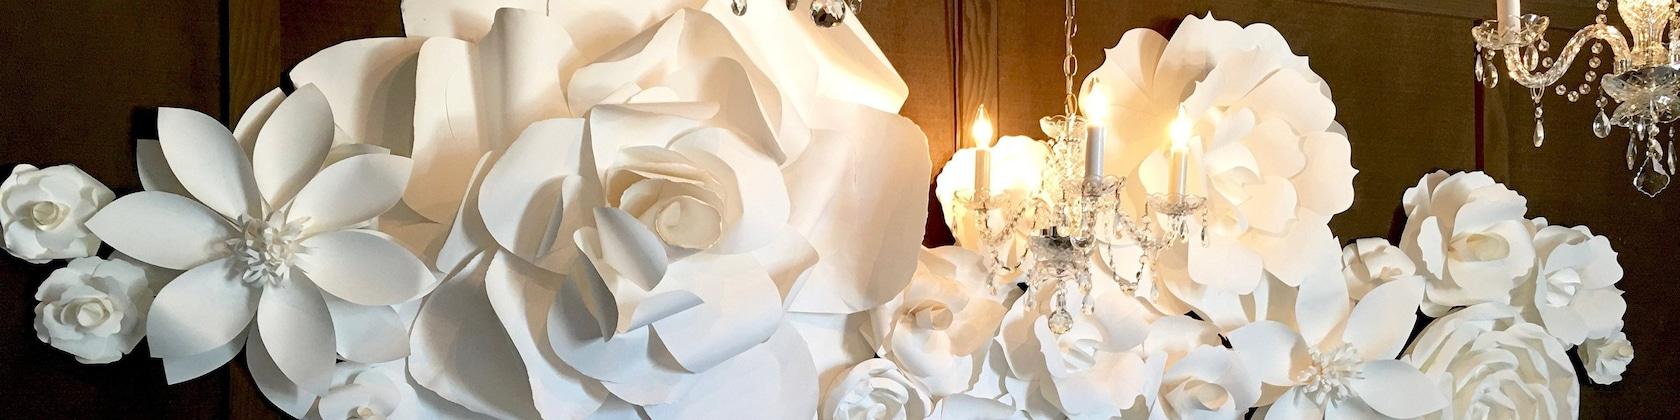 The Jade Package  paper flowers for bedroom  large paper flowers  made with quality paper